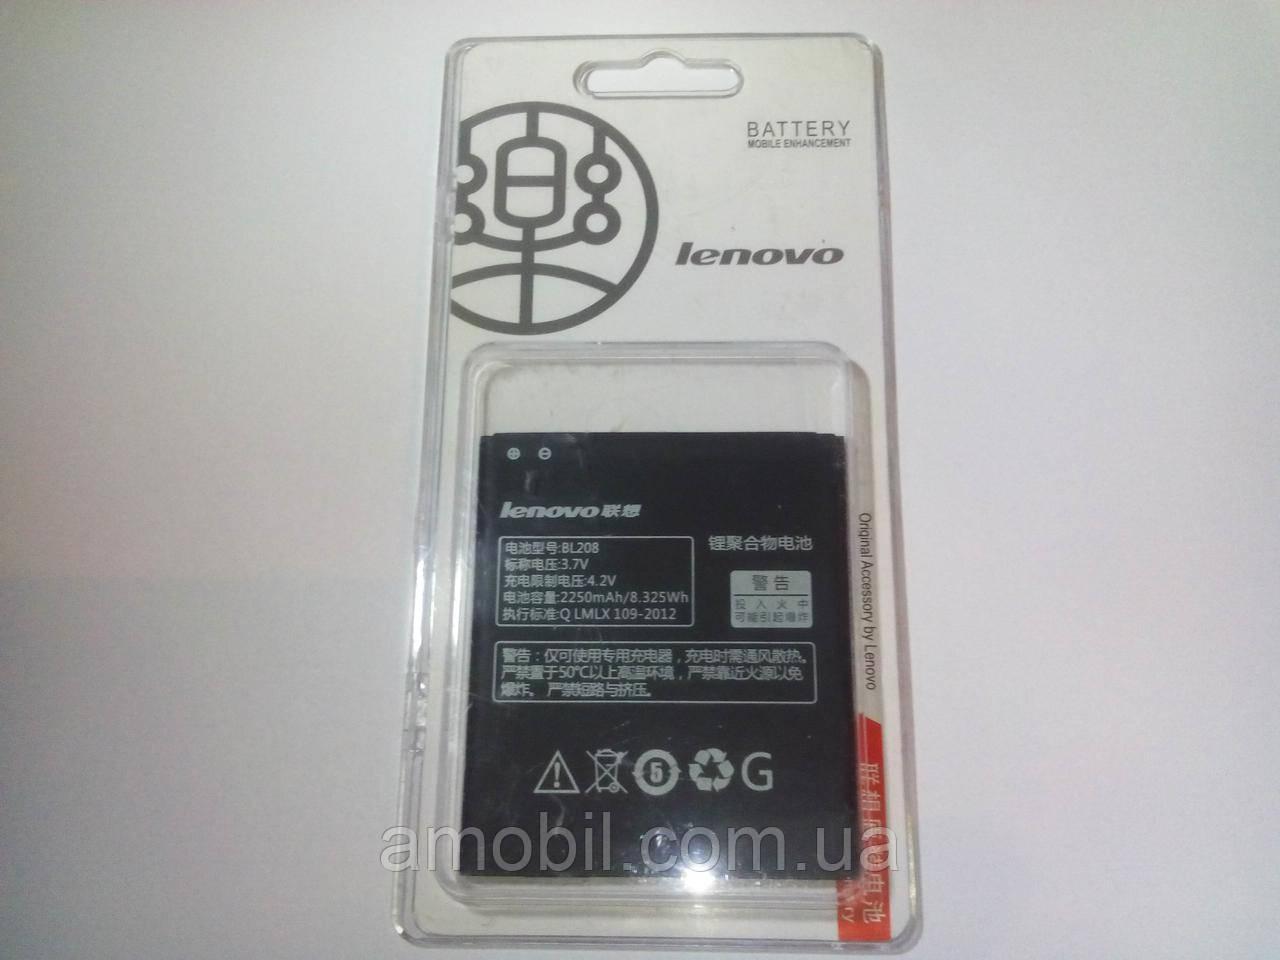 Акумулятор Lenovo BL208 S920 (2250mAh)orig